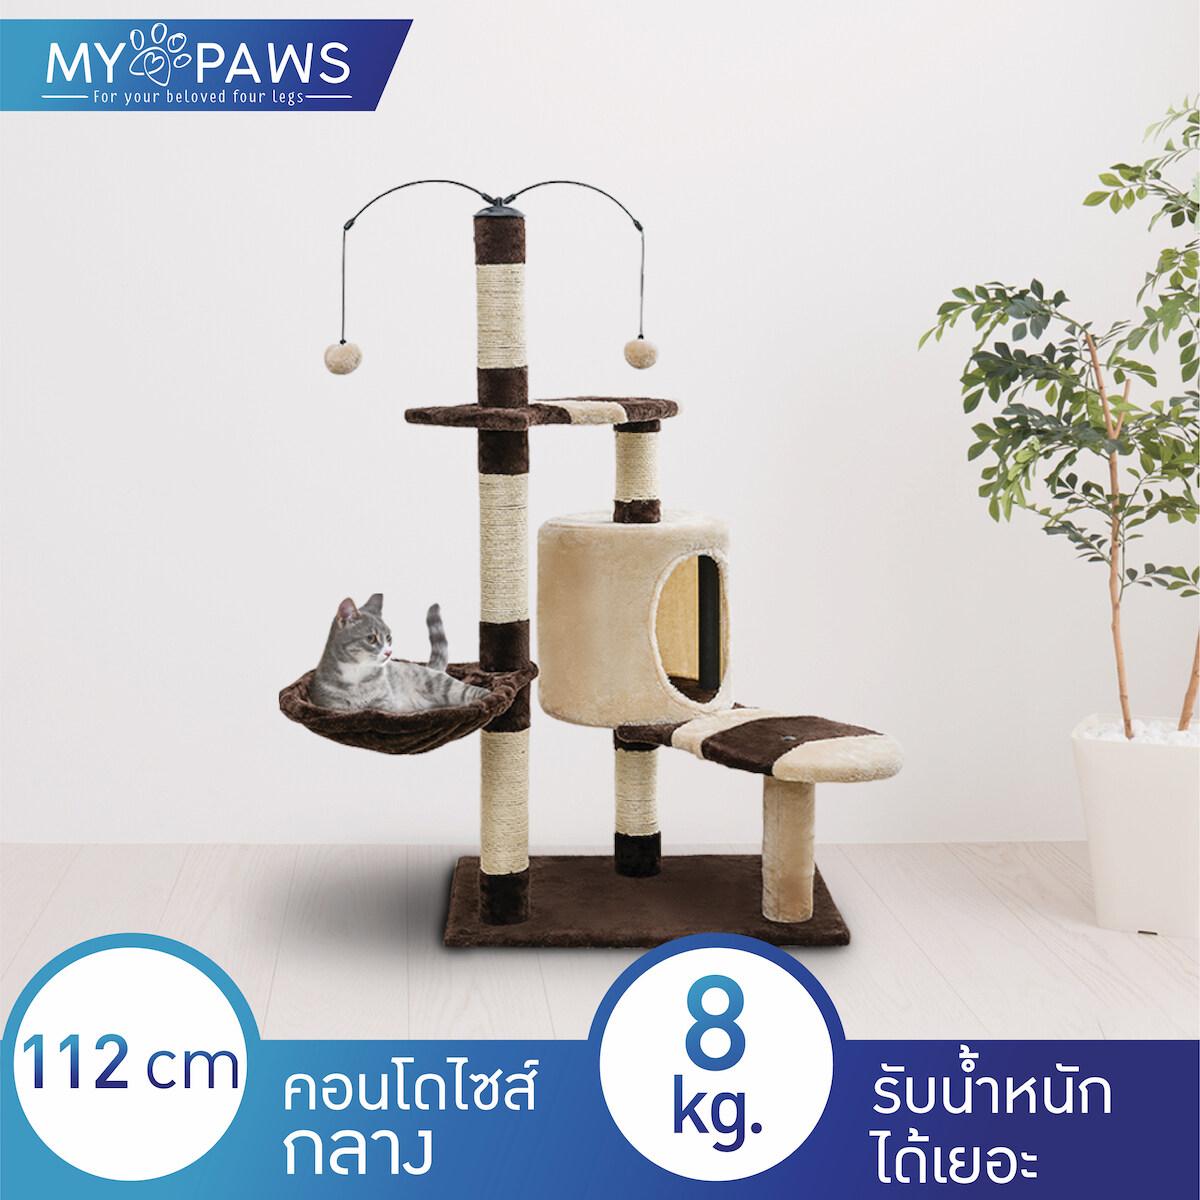 My Paws คอนโดแมว ไซส์กลาง สูง 112 ซม. บ้านแมว ของเล่นแมว นำเข้าเกรดพรีเมียม รุ่น Full of Fun